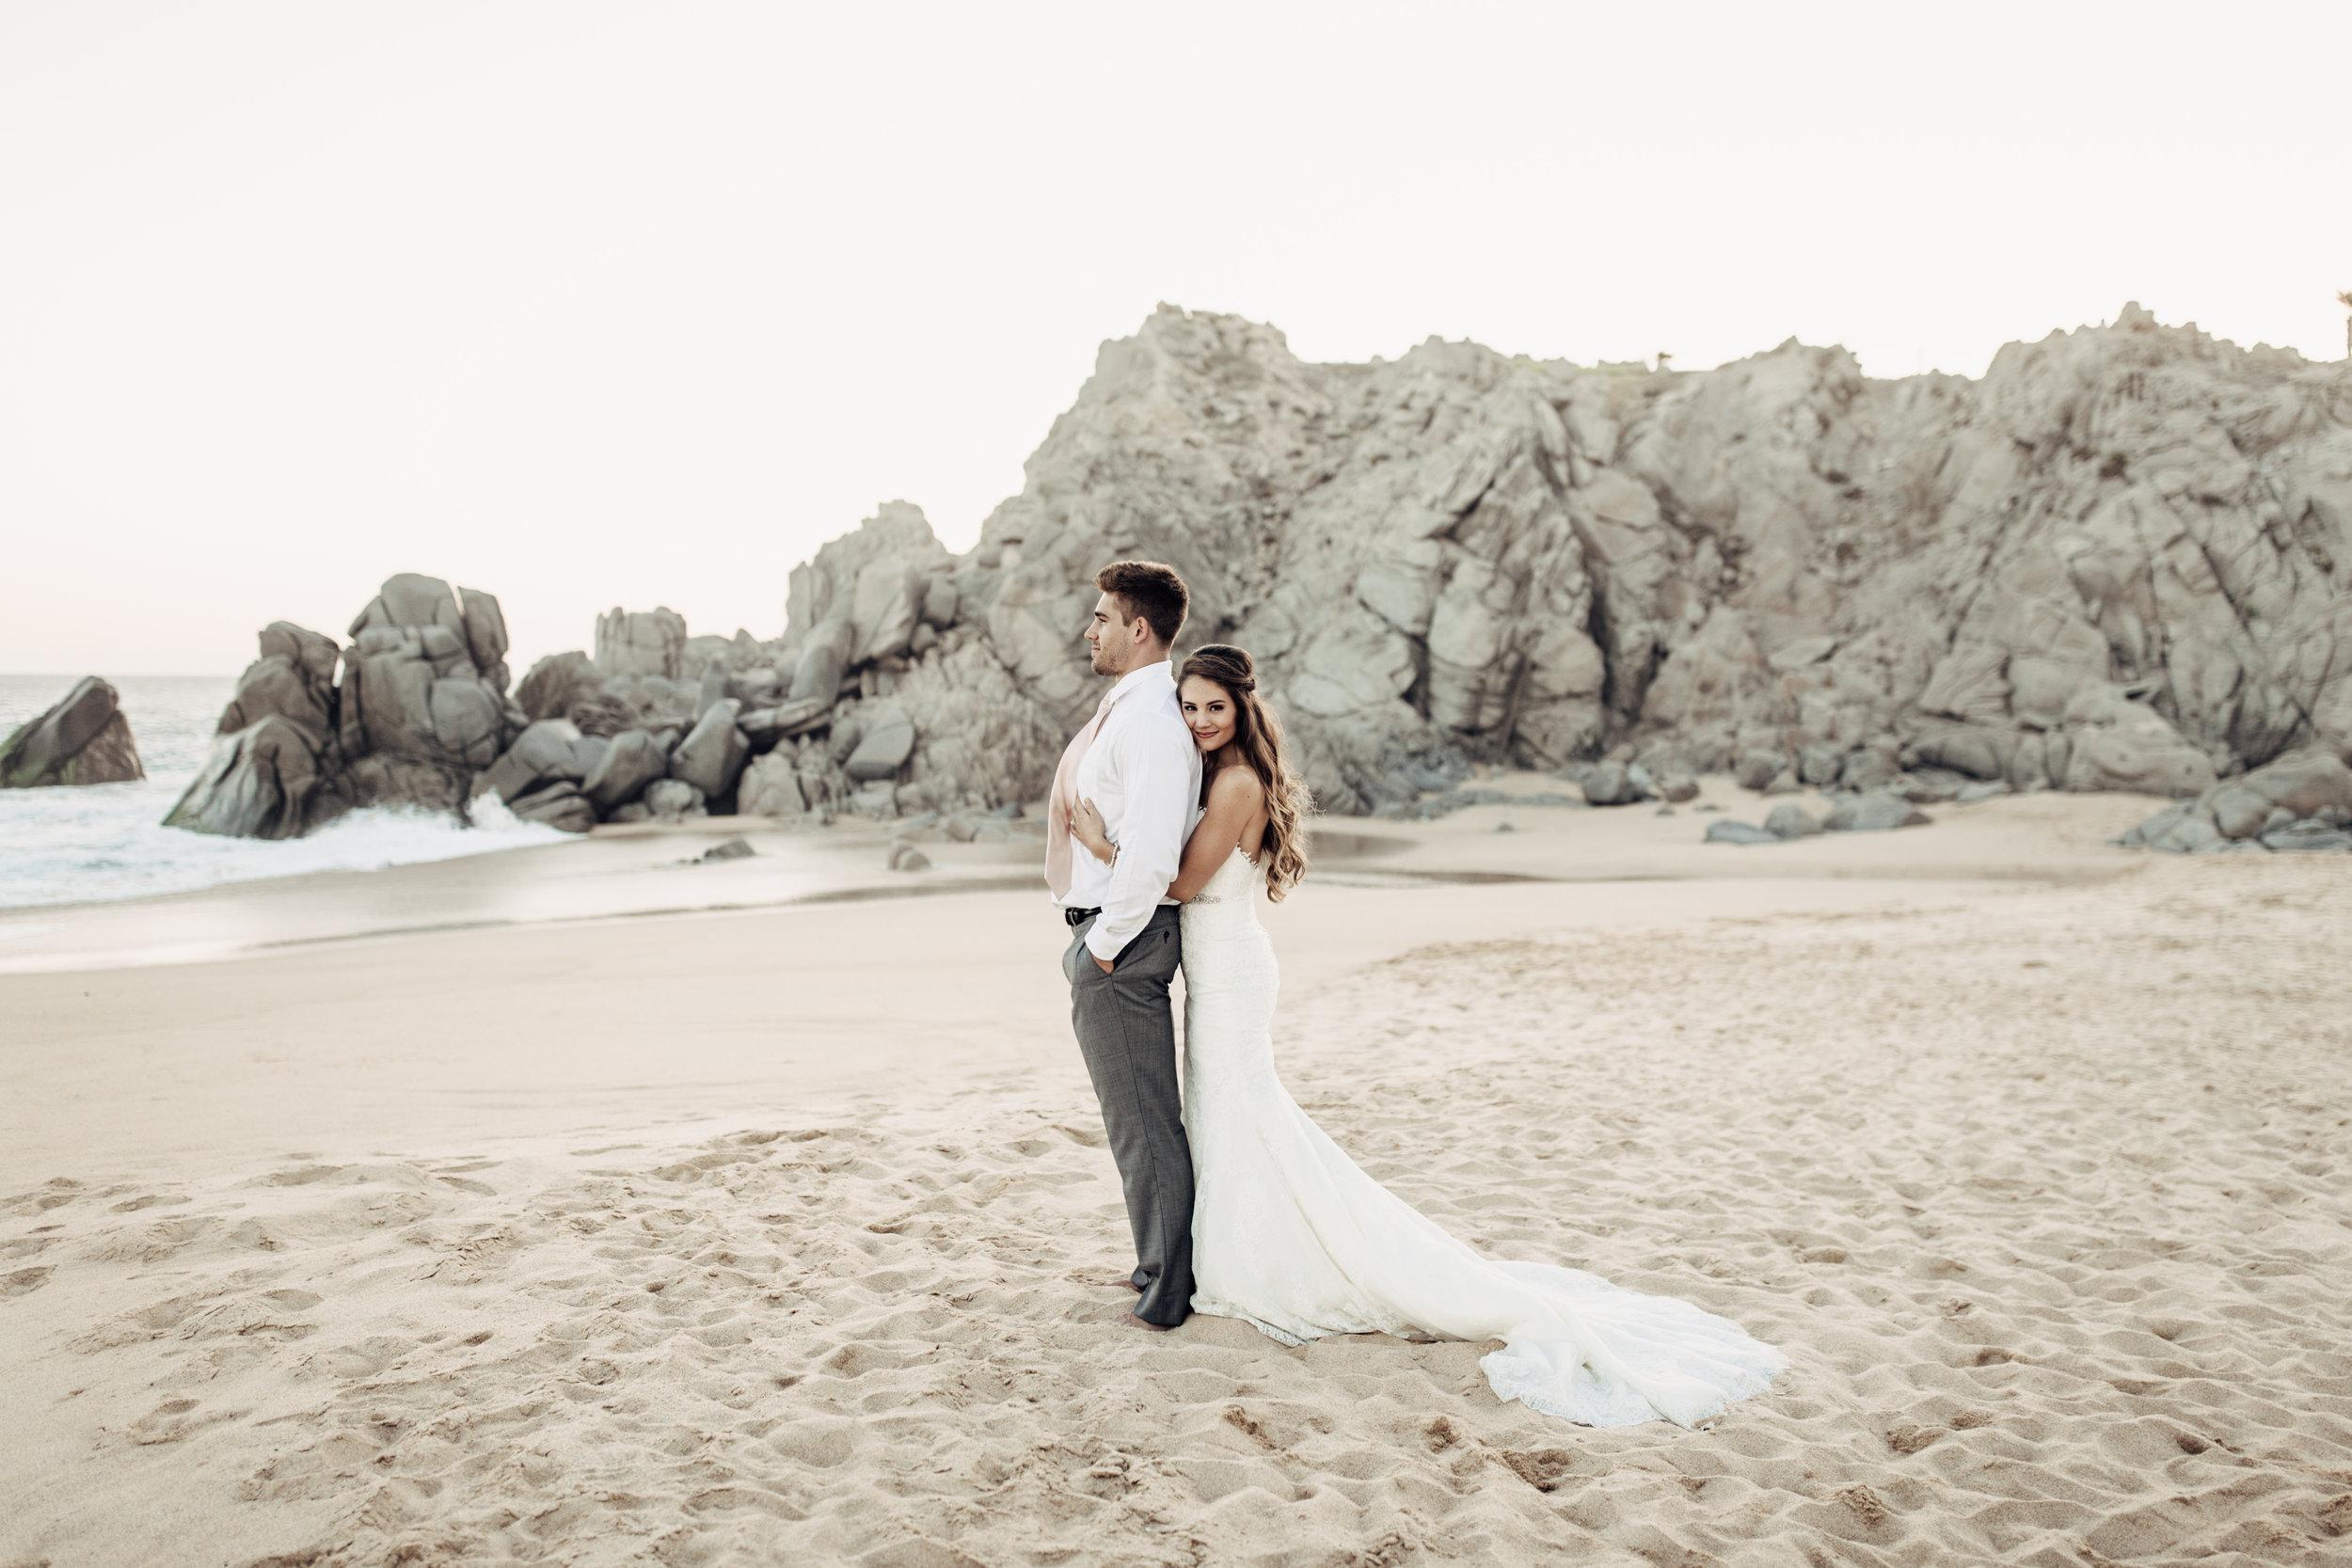 pueblo-bonito-sunset-beach-wedding-cabo-san-lucas547.jpg